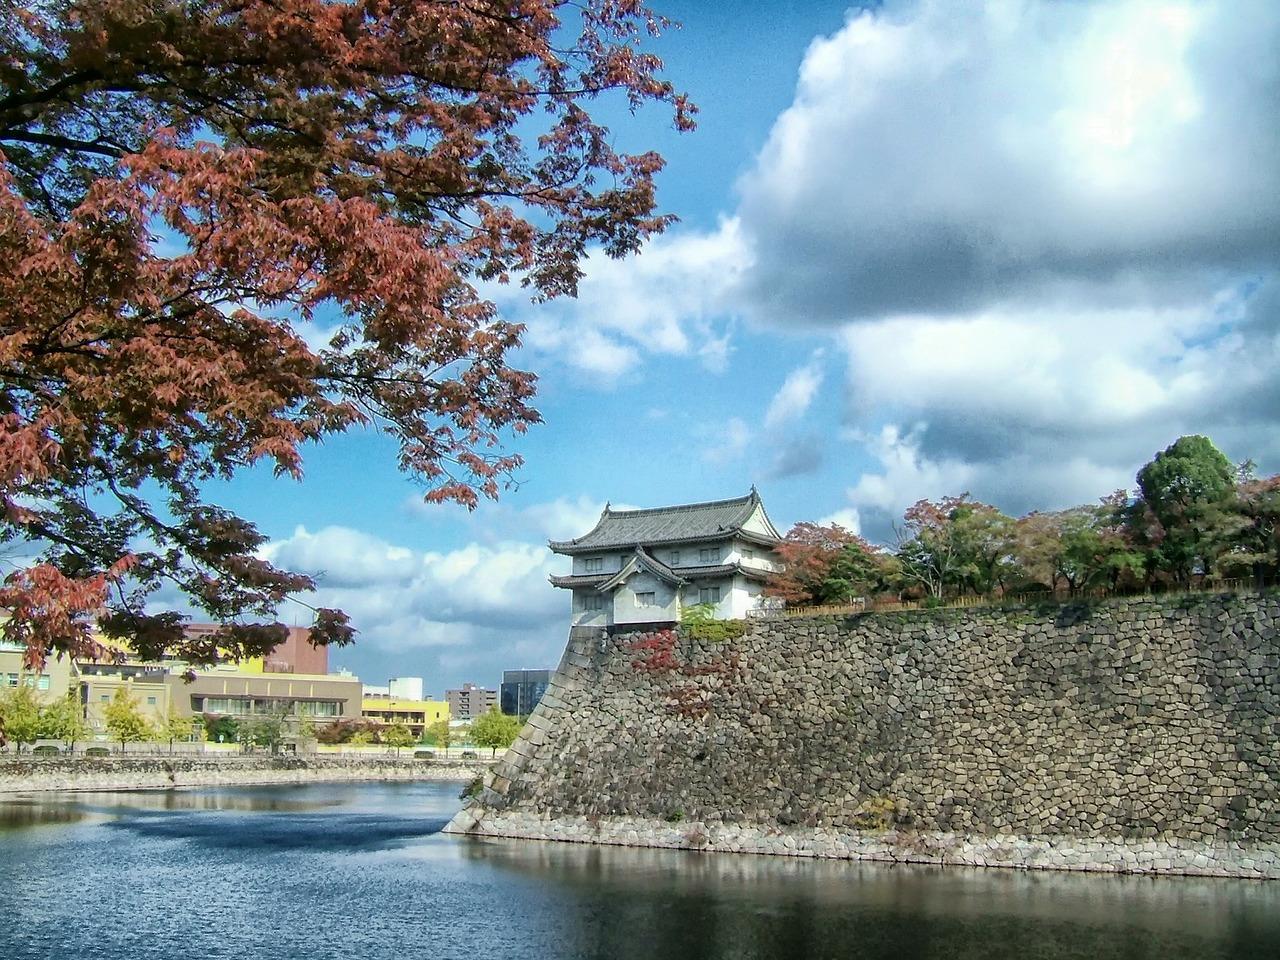 Japan Deals   Flug Frankfurt Osaka hin & zurück ab 497,00€ 1